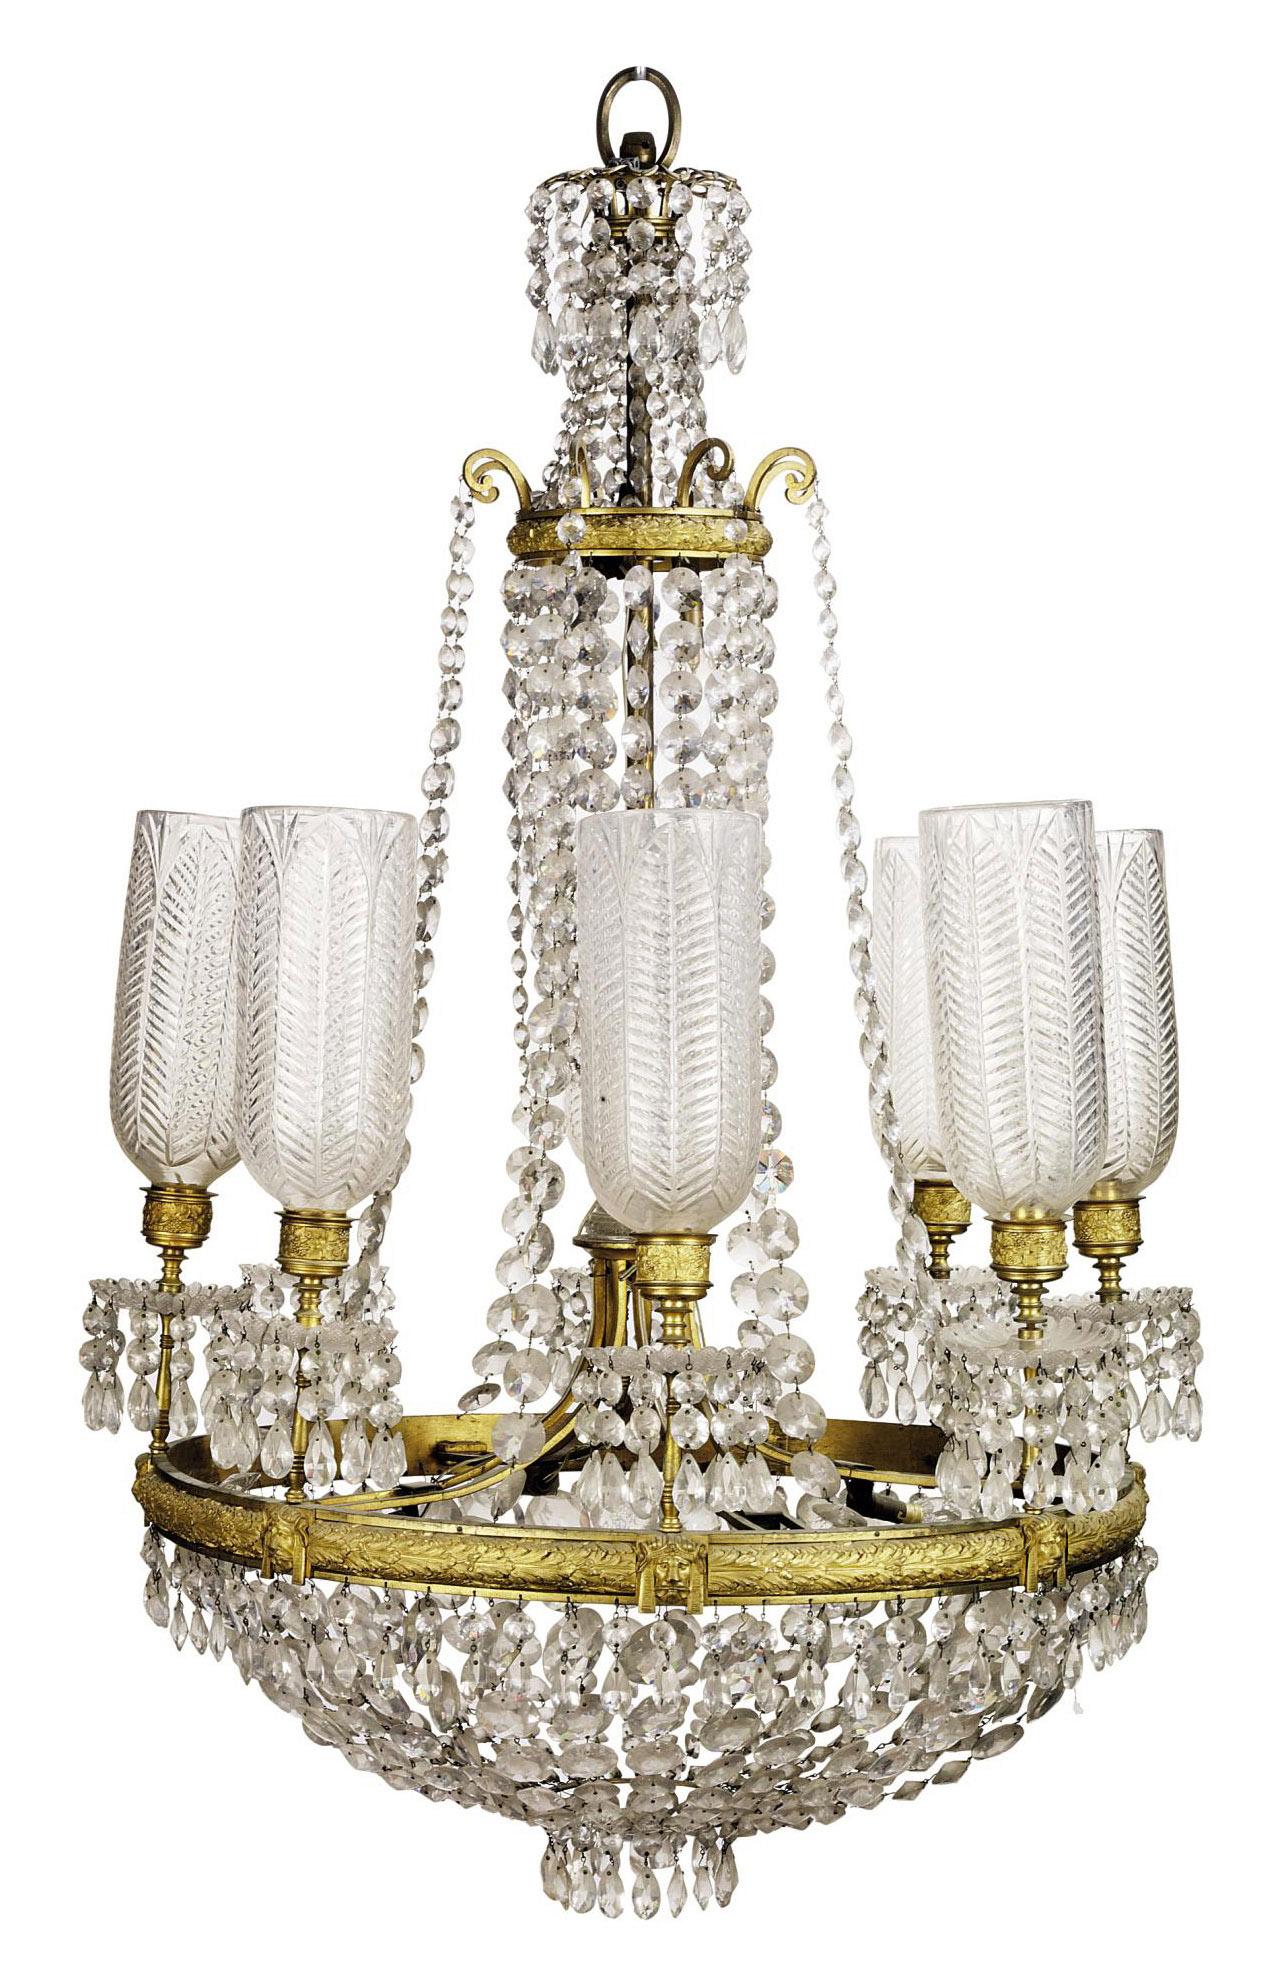 A REGENCY ORMOLU AND CUT-GLASS EIGHT-LIGHT CHANDELIER